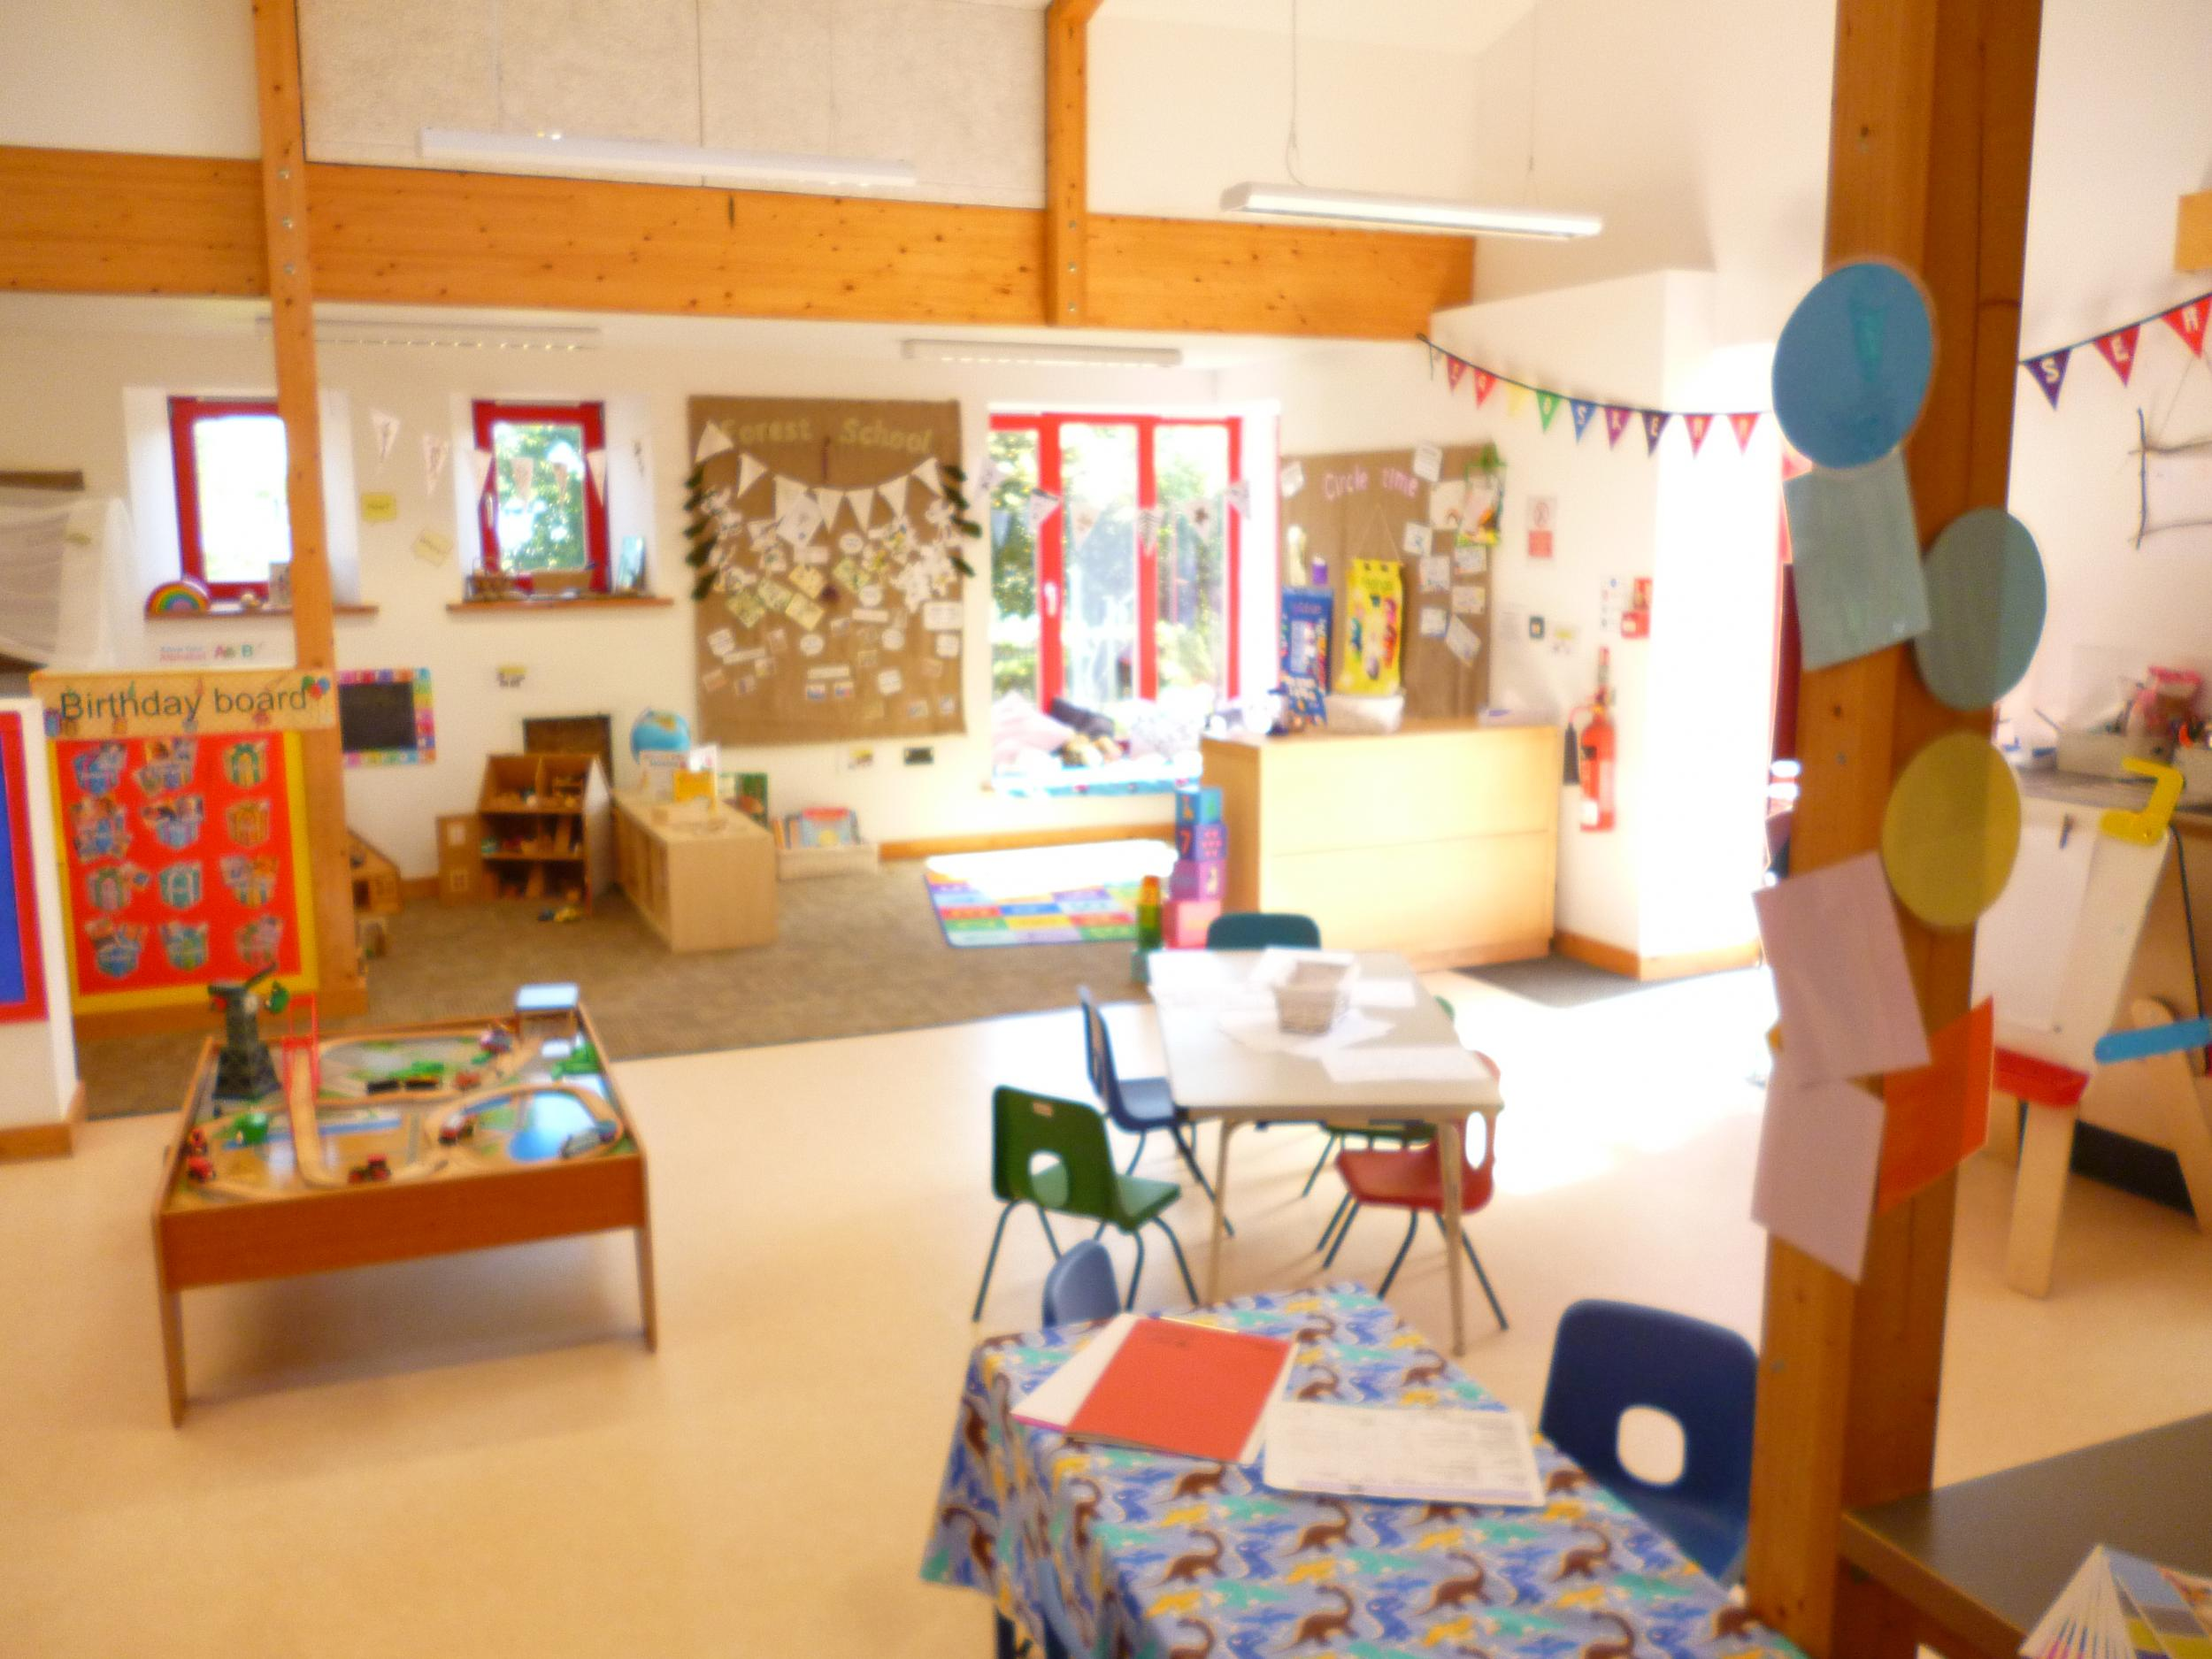 A nursery classroom